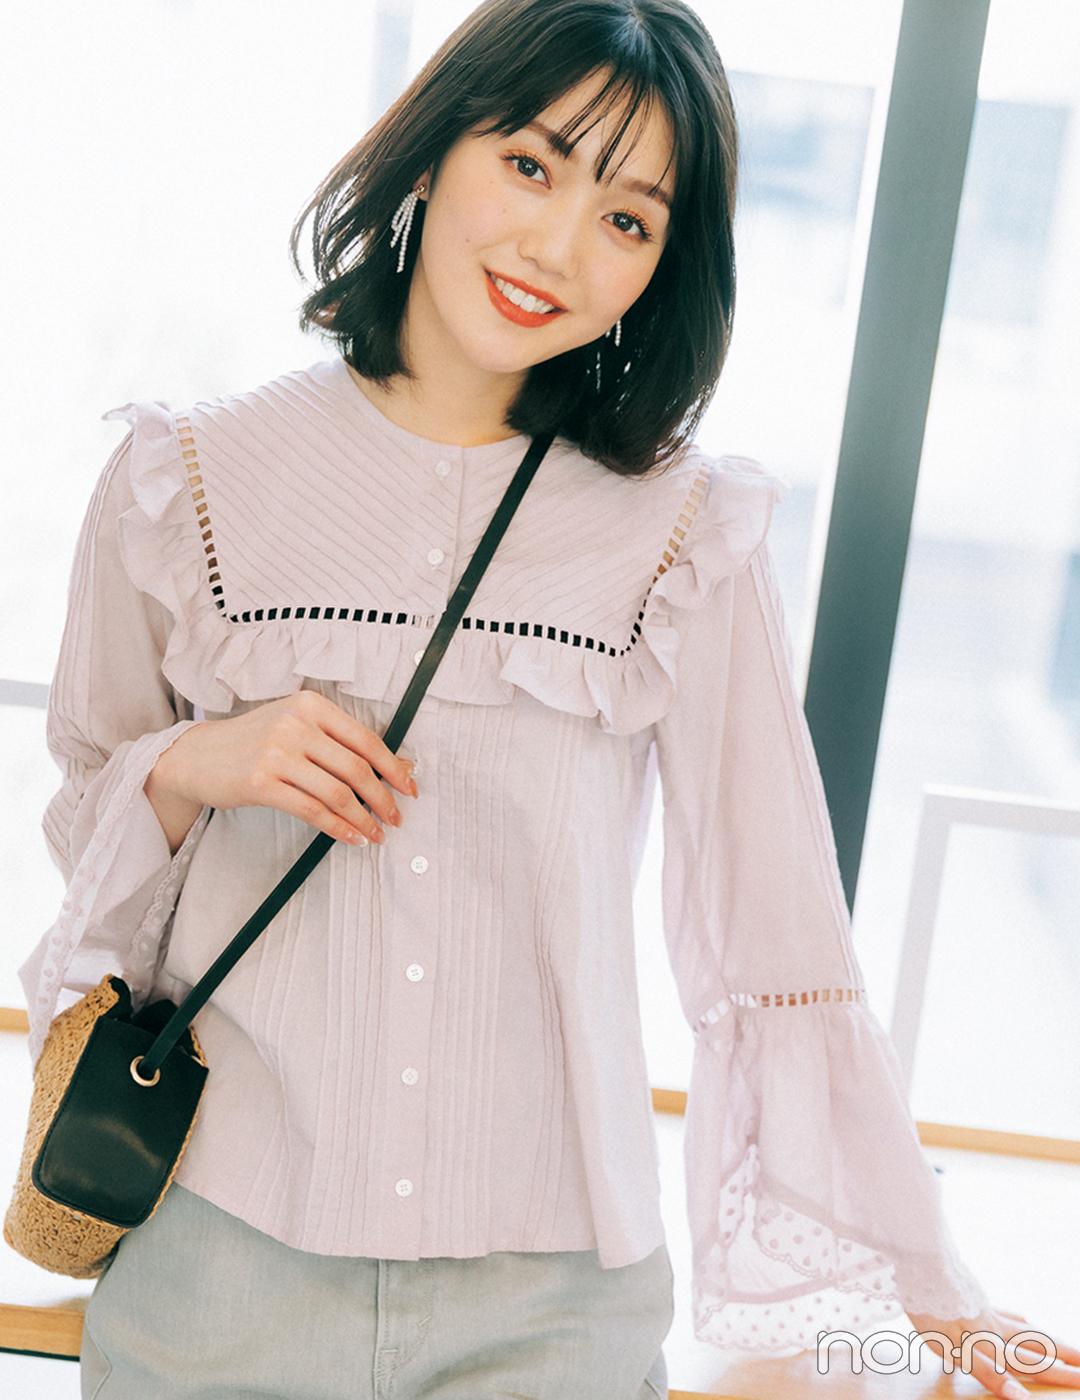 Photo Gallery ノンノモデル・松川菜々花 最新フォトギャラリー_1_4